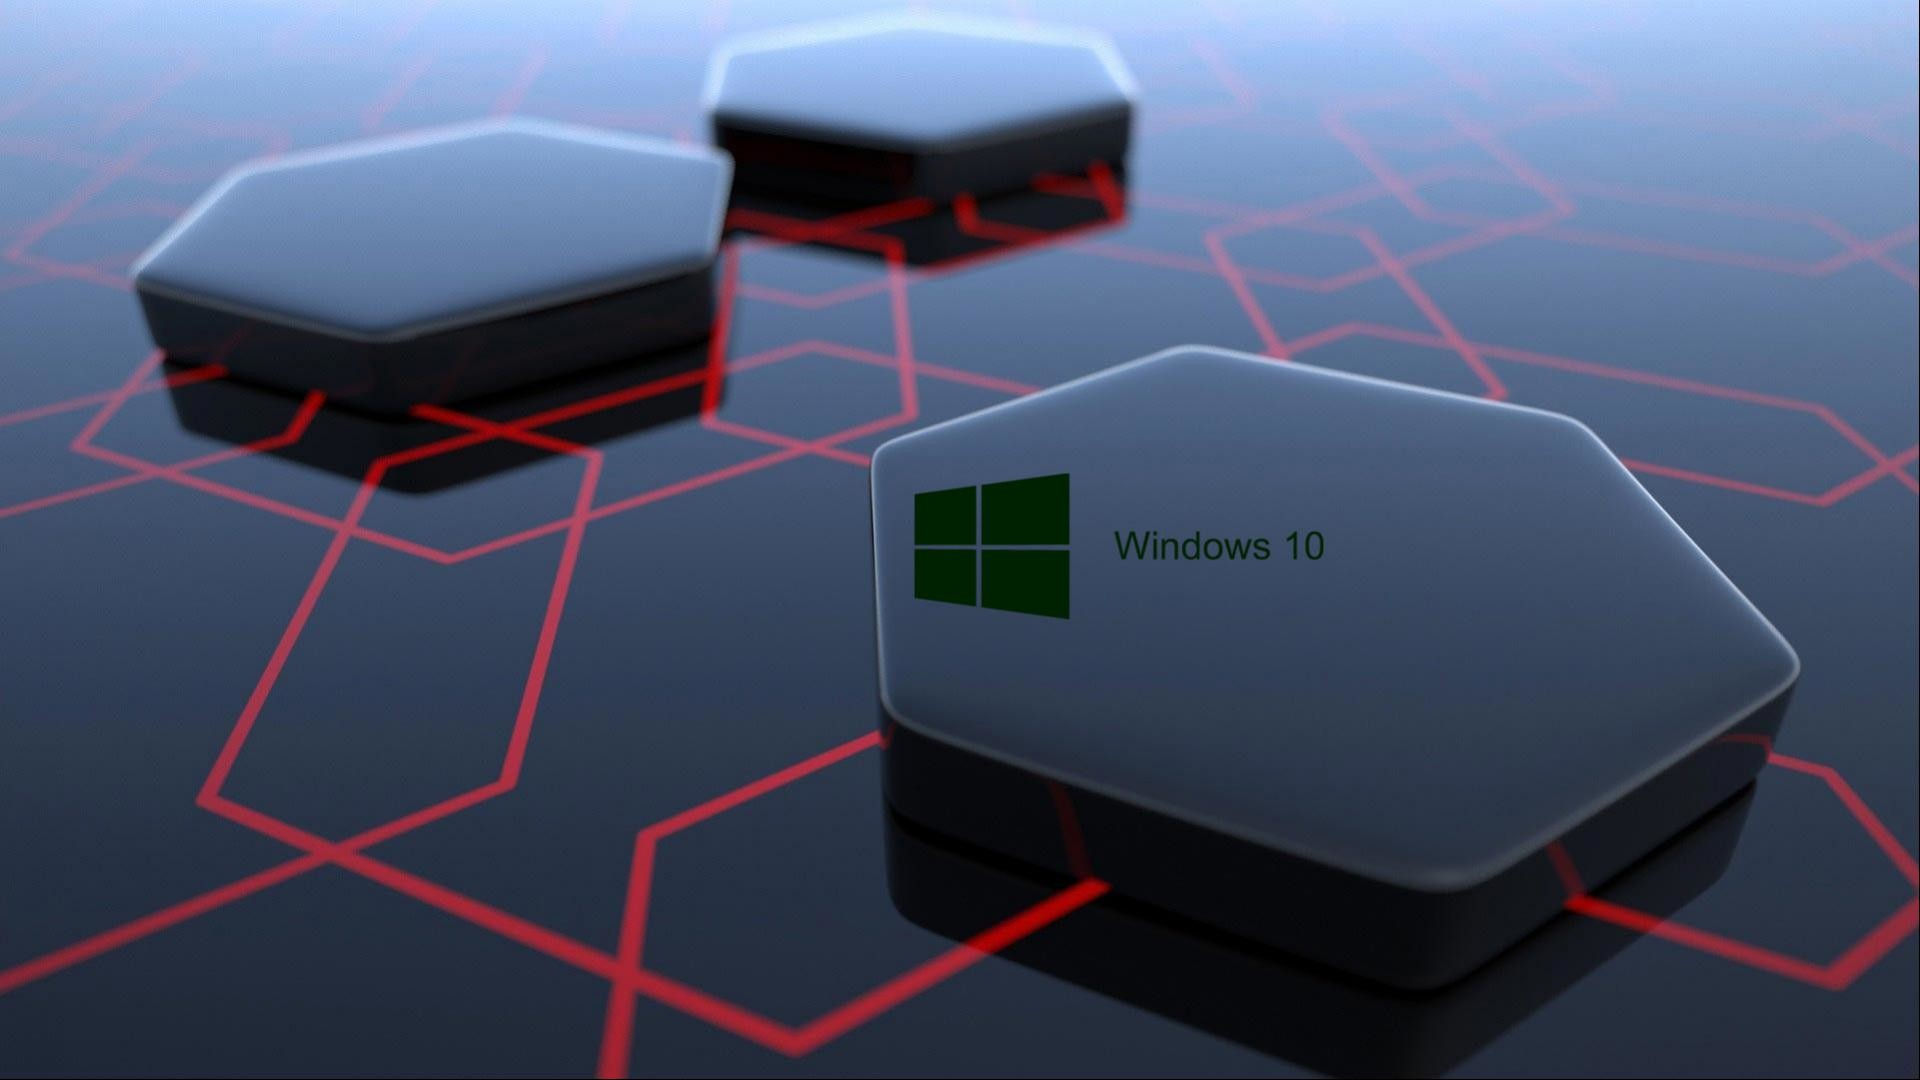 Windows 10 Desktop Image with 3d Art Black Hexagonal Wallpapers | HD .